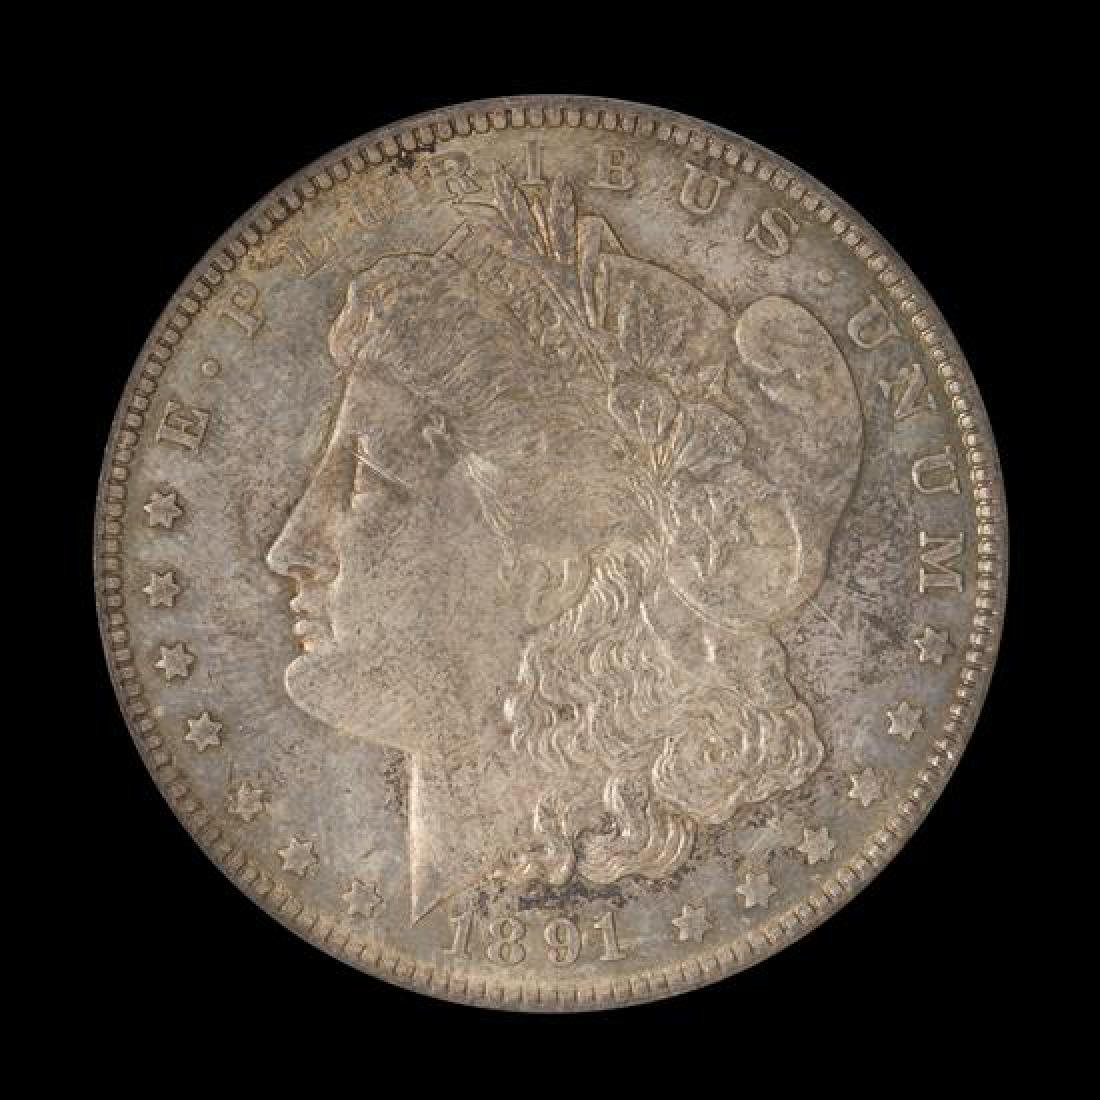 A United States 1891-CC Morgan Silver Dollar Coin